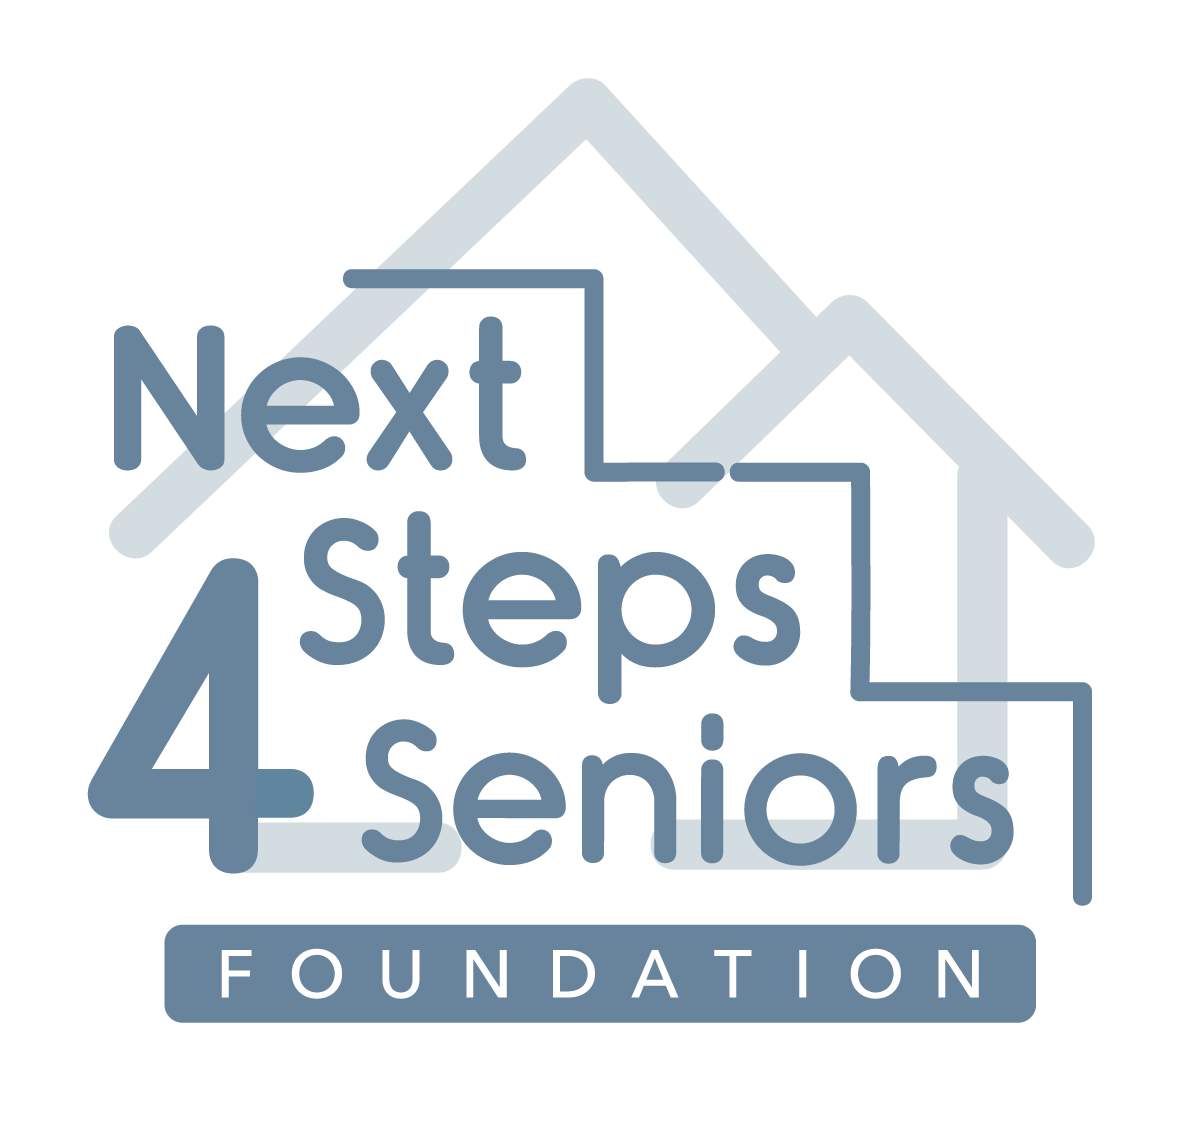 Next Steps 4 Seniors